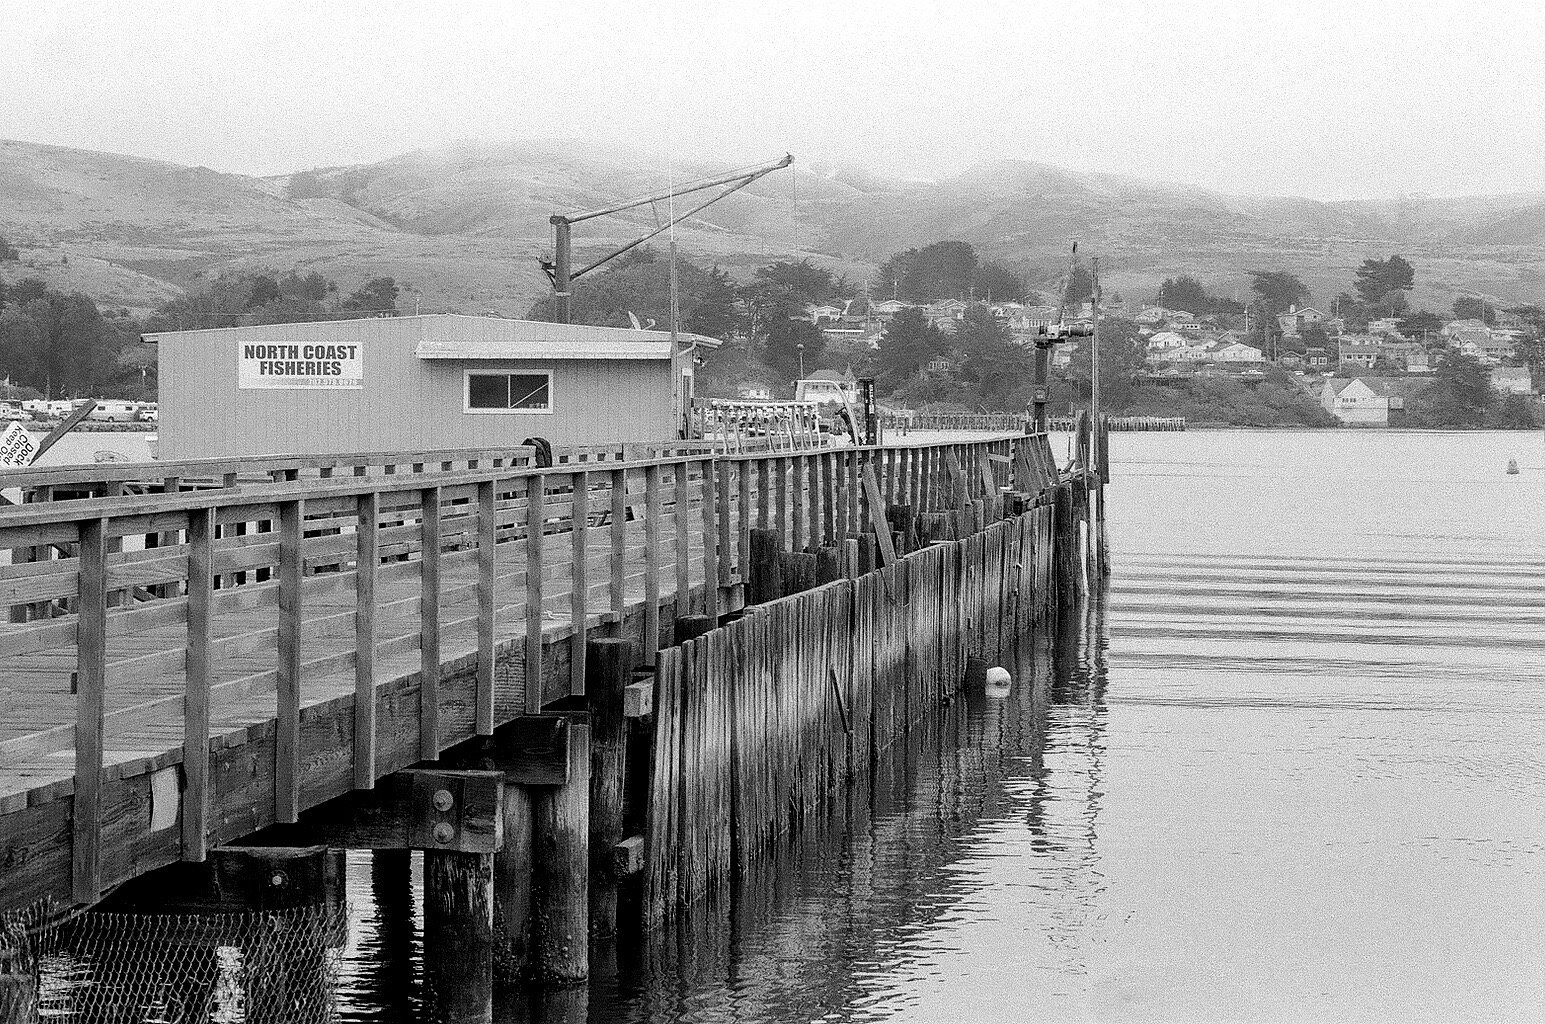 Spud Point Marina, Bodega Bay. Nikon F2A, 85mm f/1.4 Nikkor